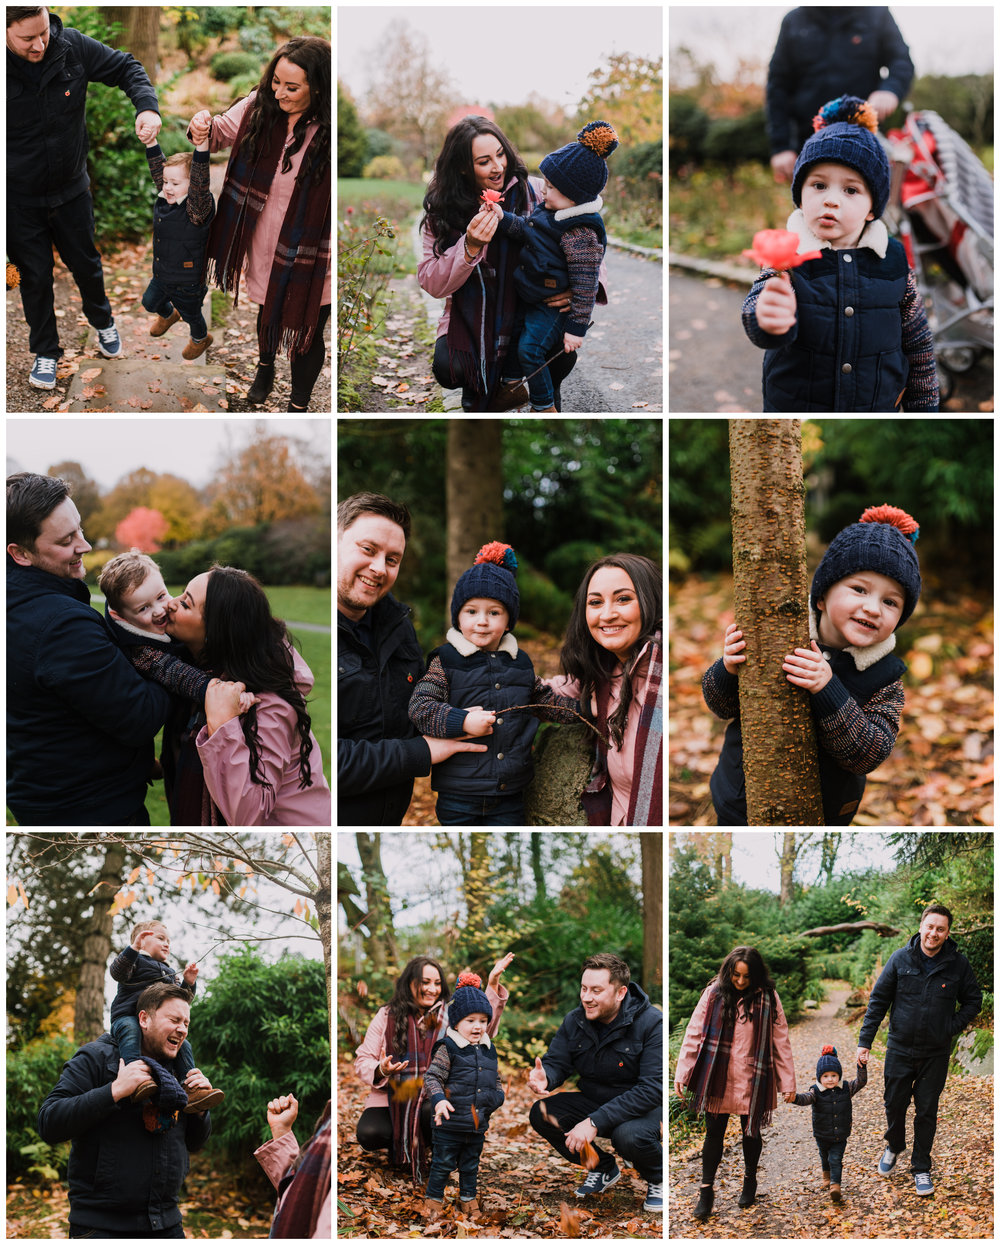 family photographer belfast, northern ireland family photographer, family sessions, family shoot, family photographer, family shoots (1).jpg